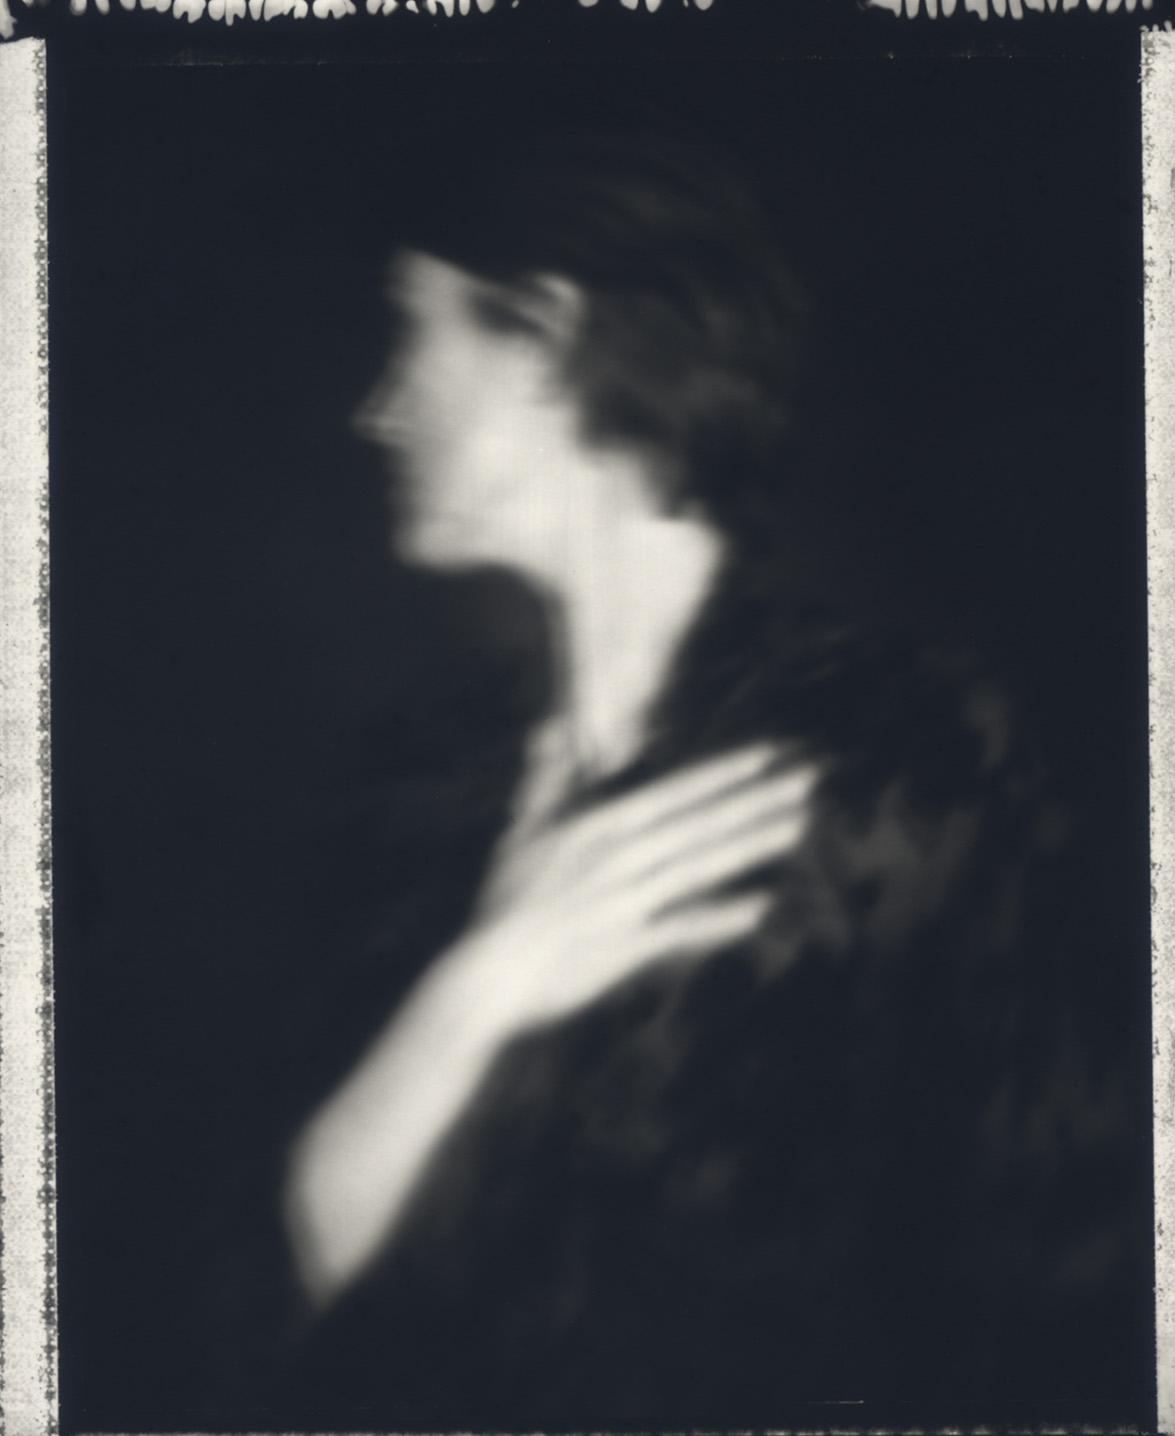 Self Portrait #77A, 2002